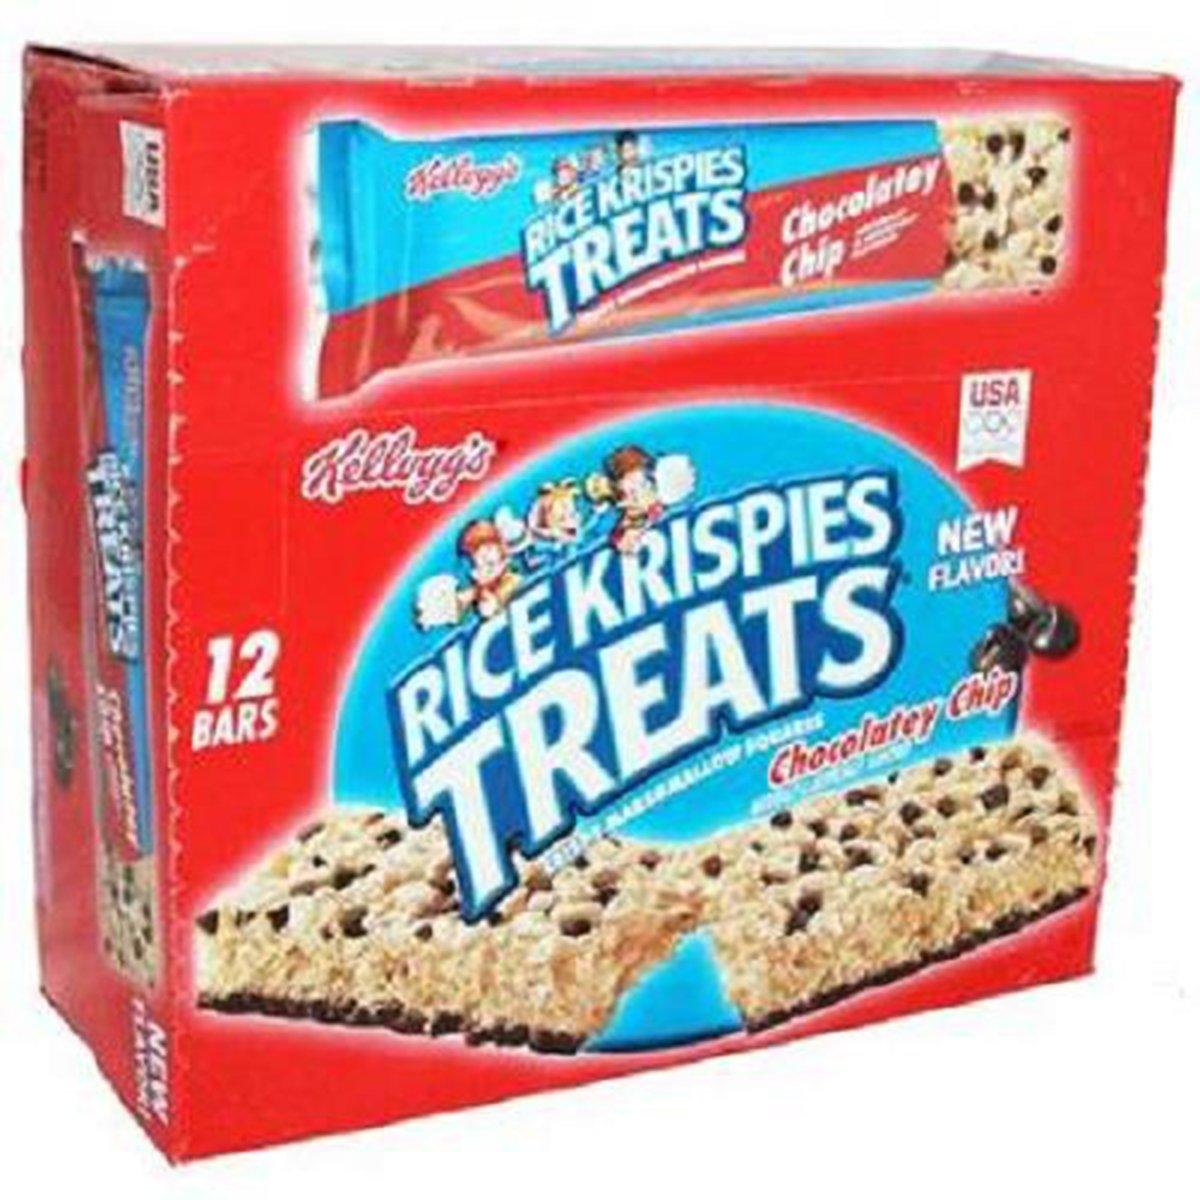 Kelloggs Rice Krispies Treats Chocolatey Chip Big Bar, 12 Count (GRANOLA/CEREAL/OAT/BRKFAST BAR)